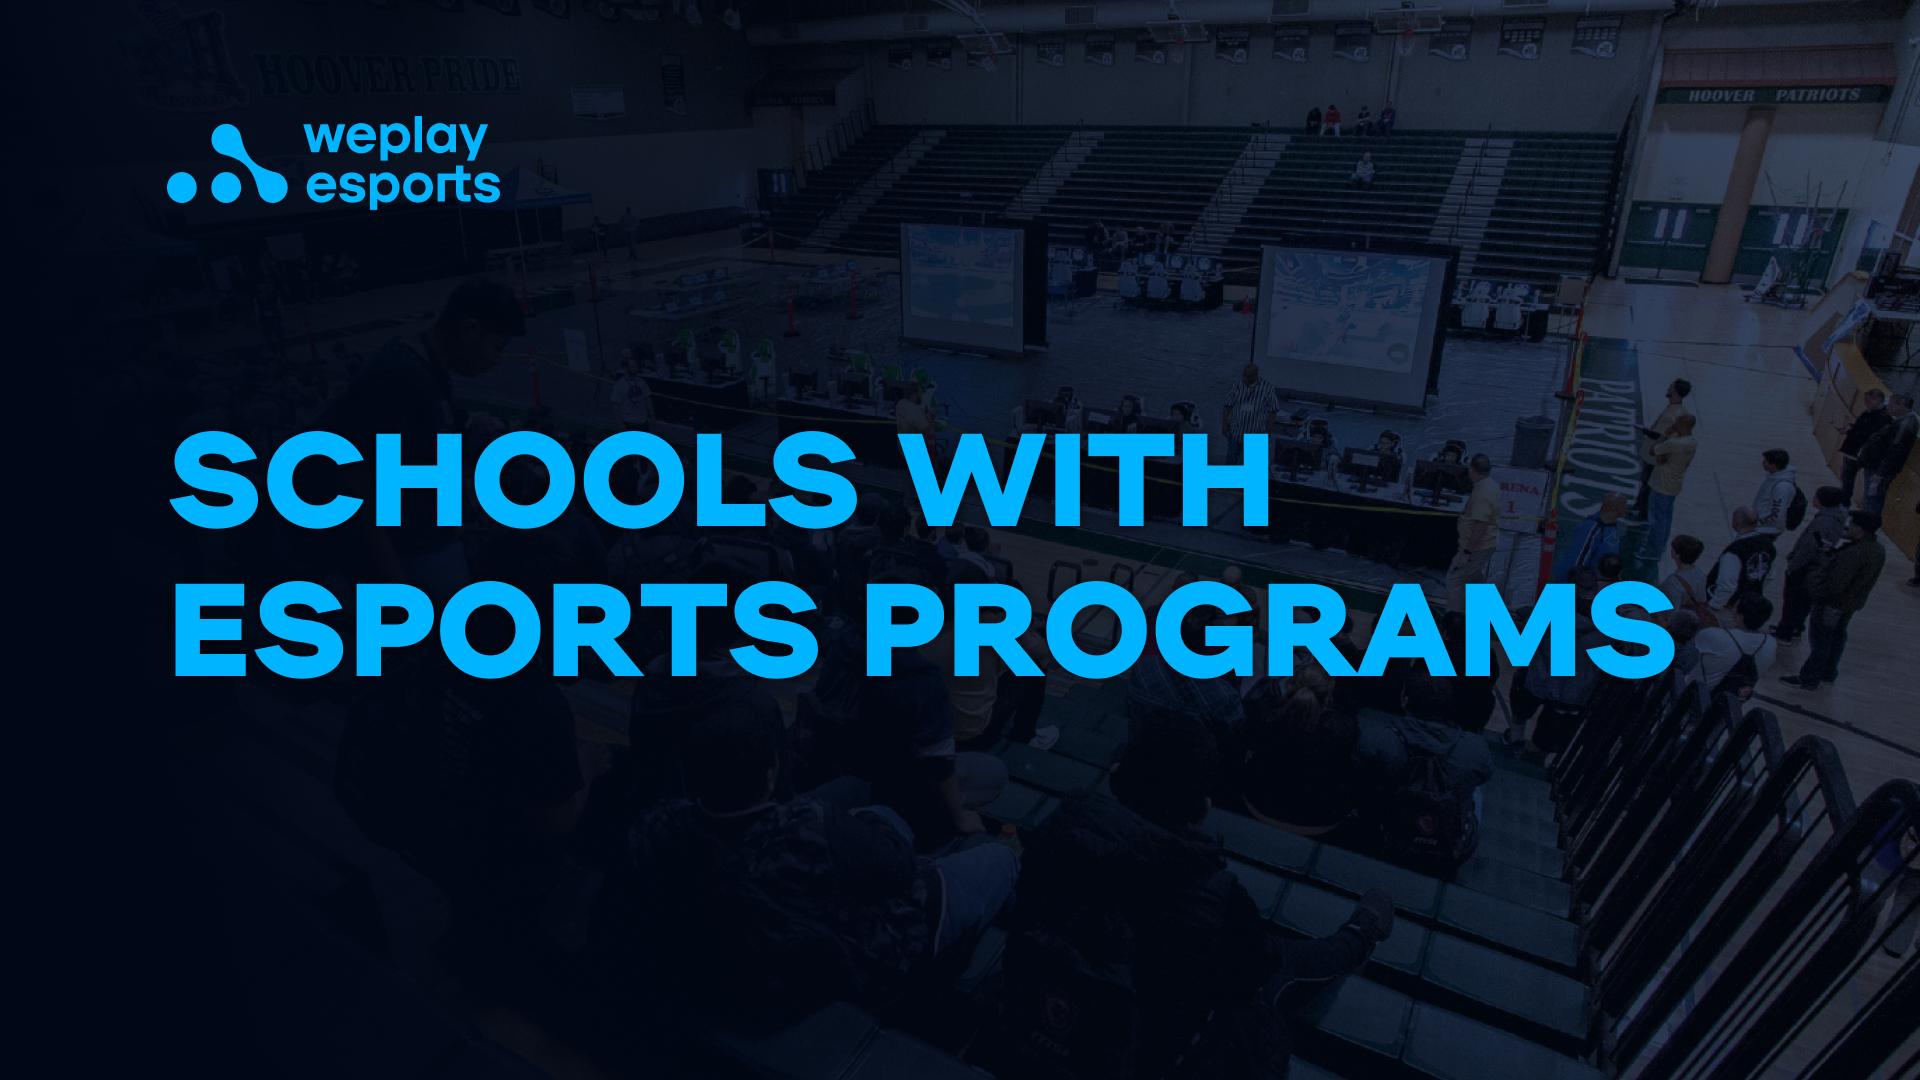 Schools with esports programs